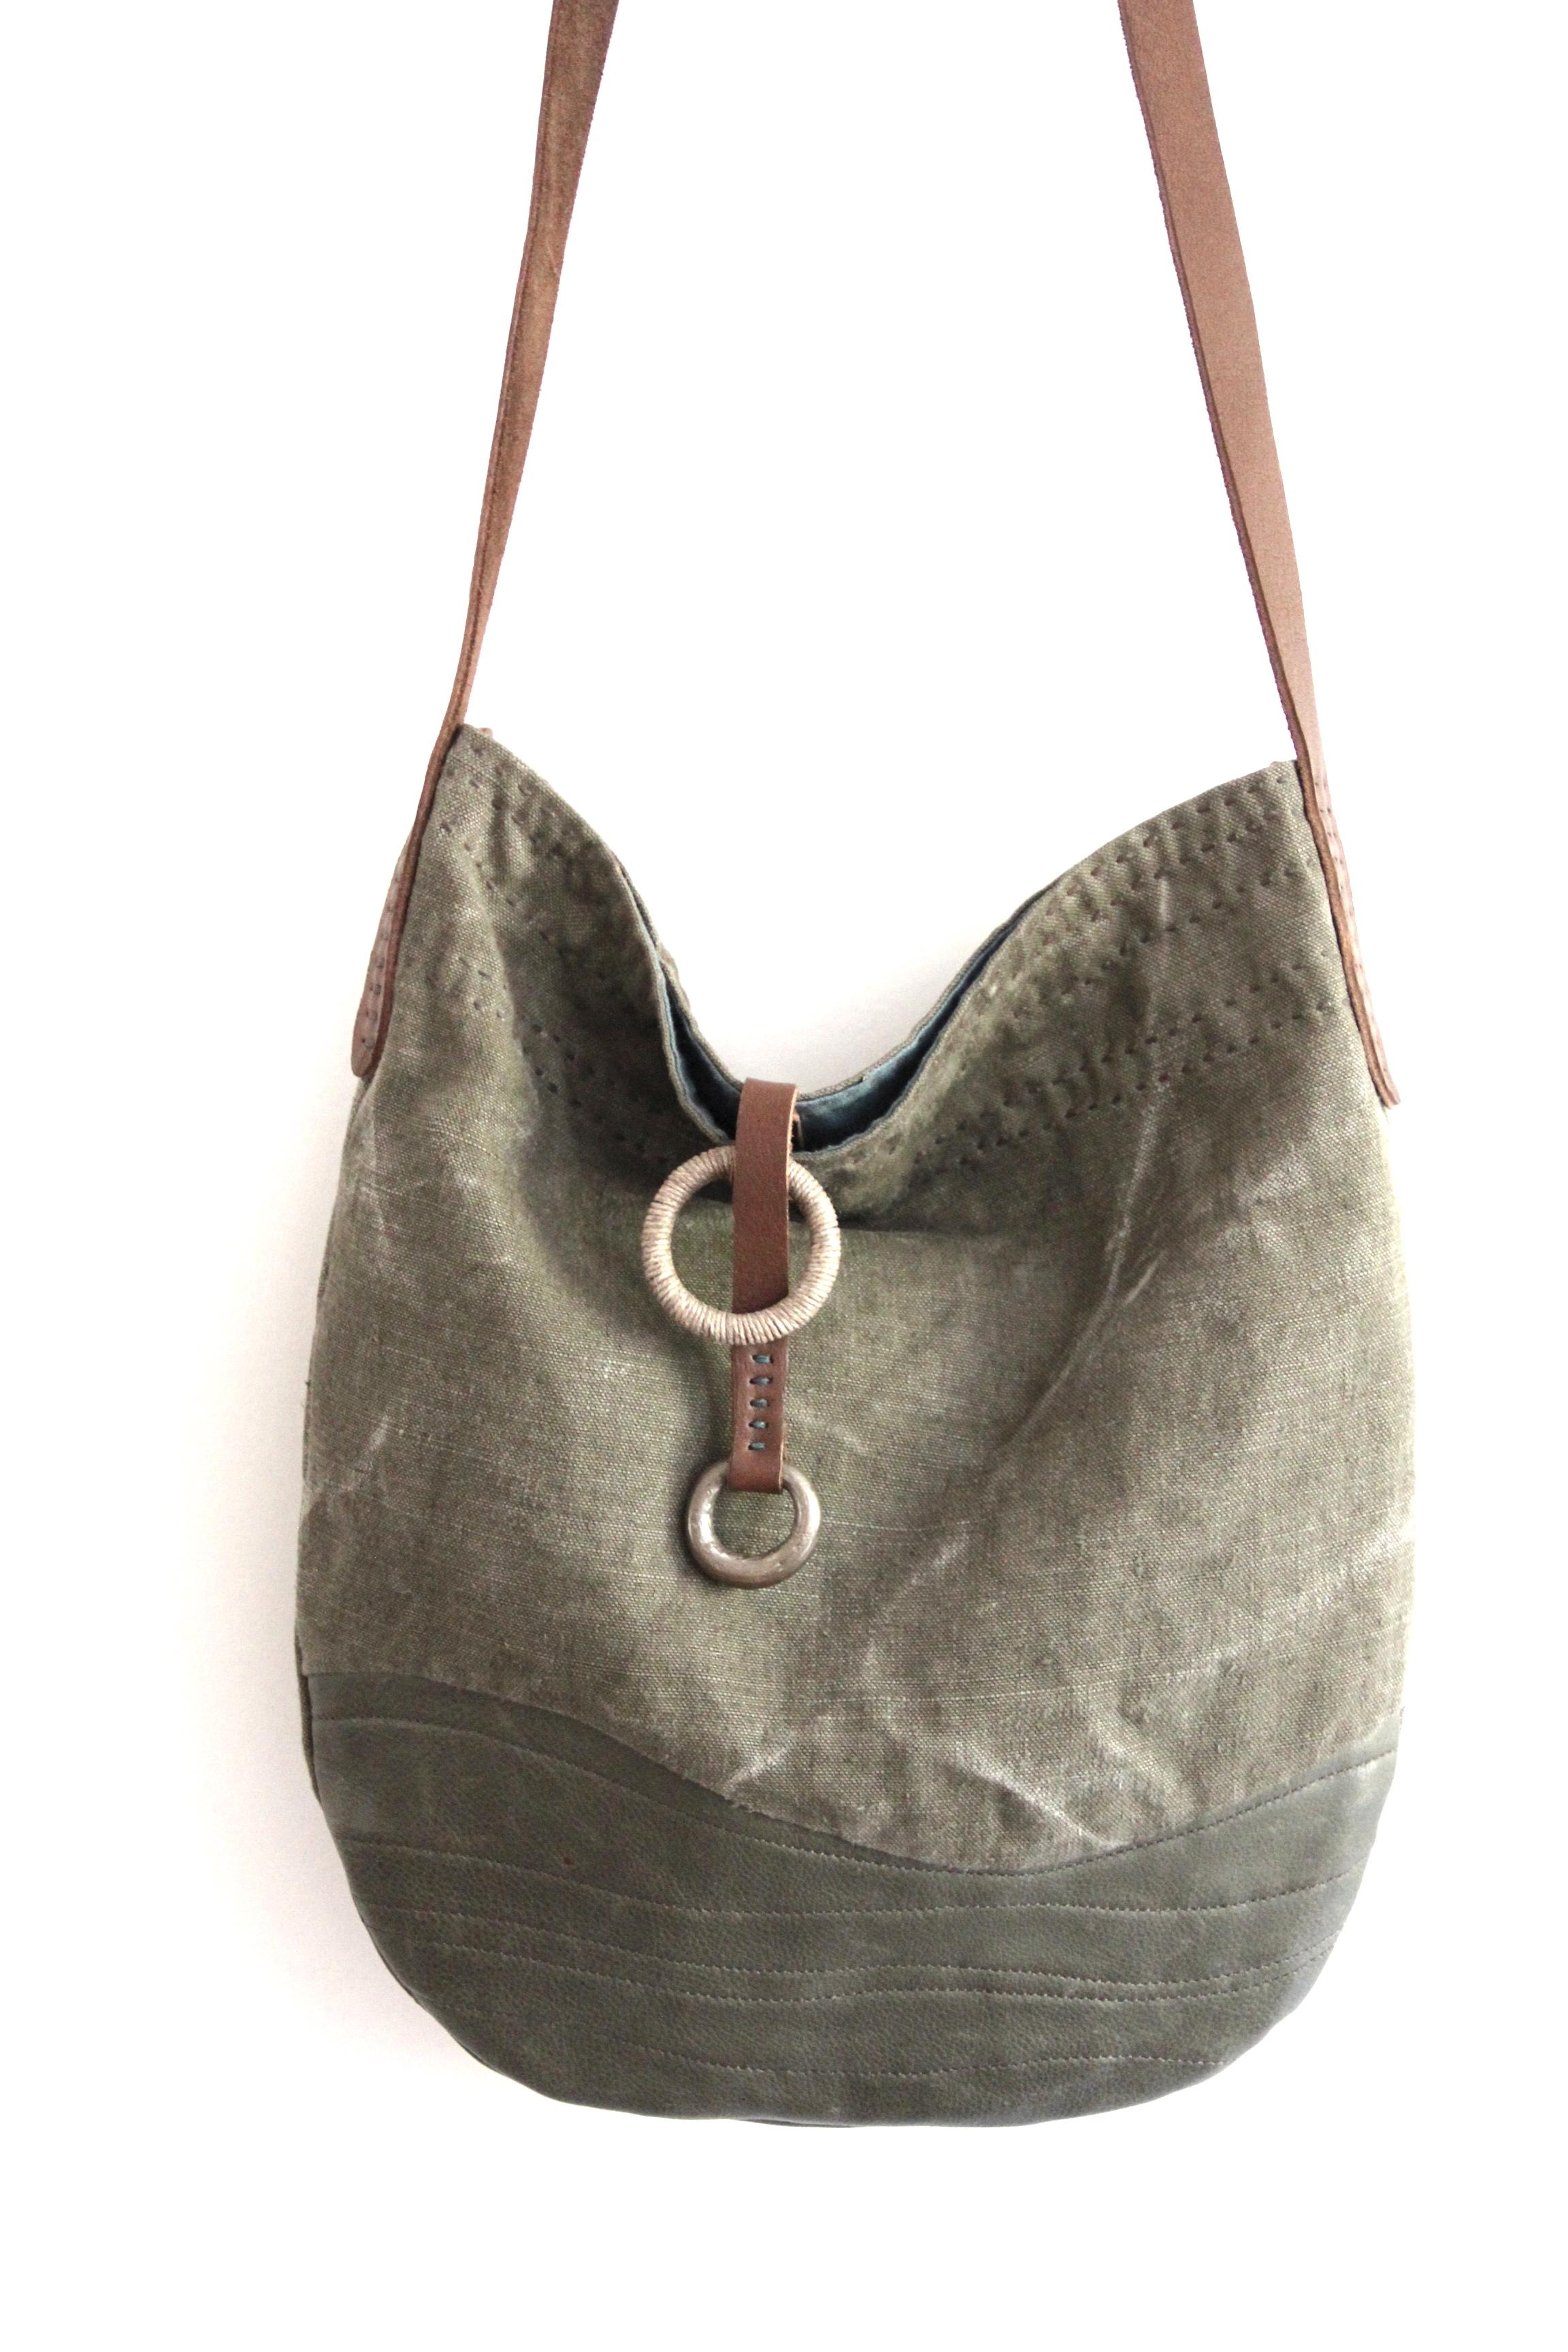 The Horizon Cross Shoulder Bag